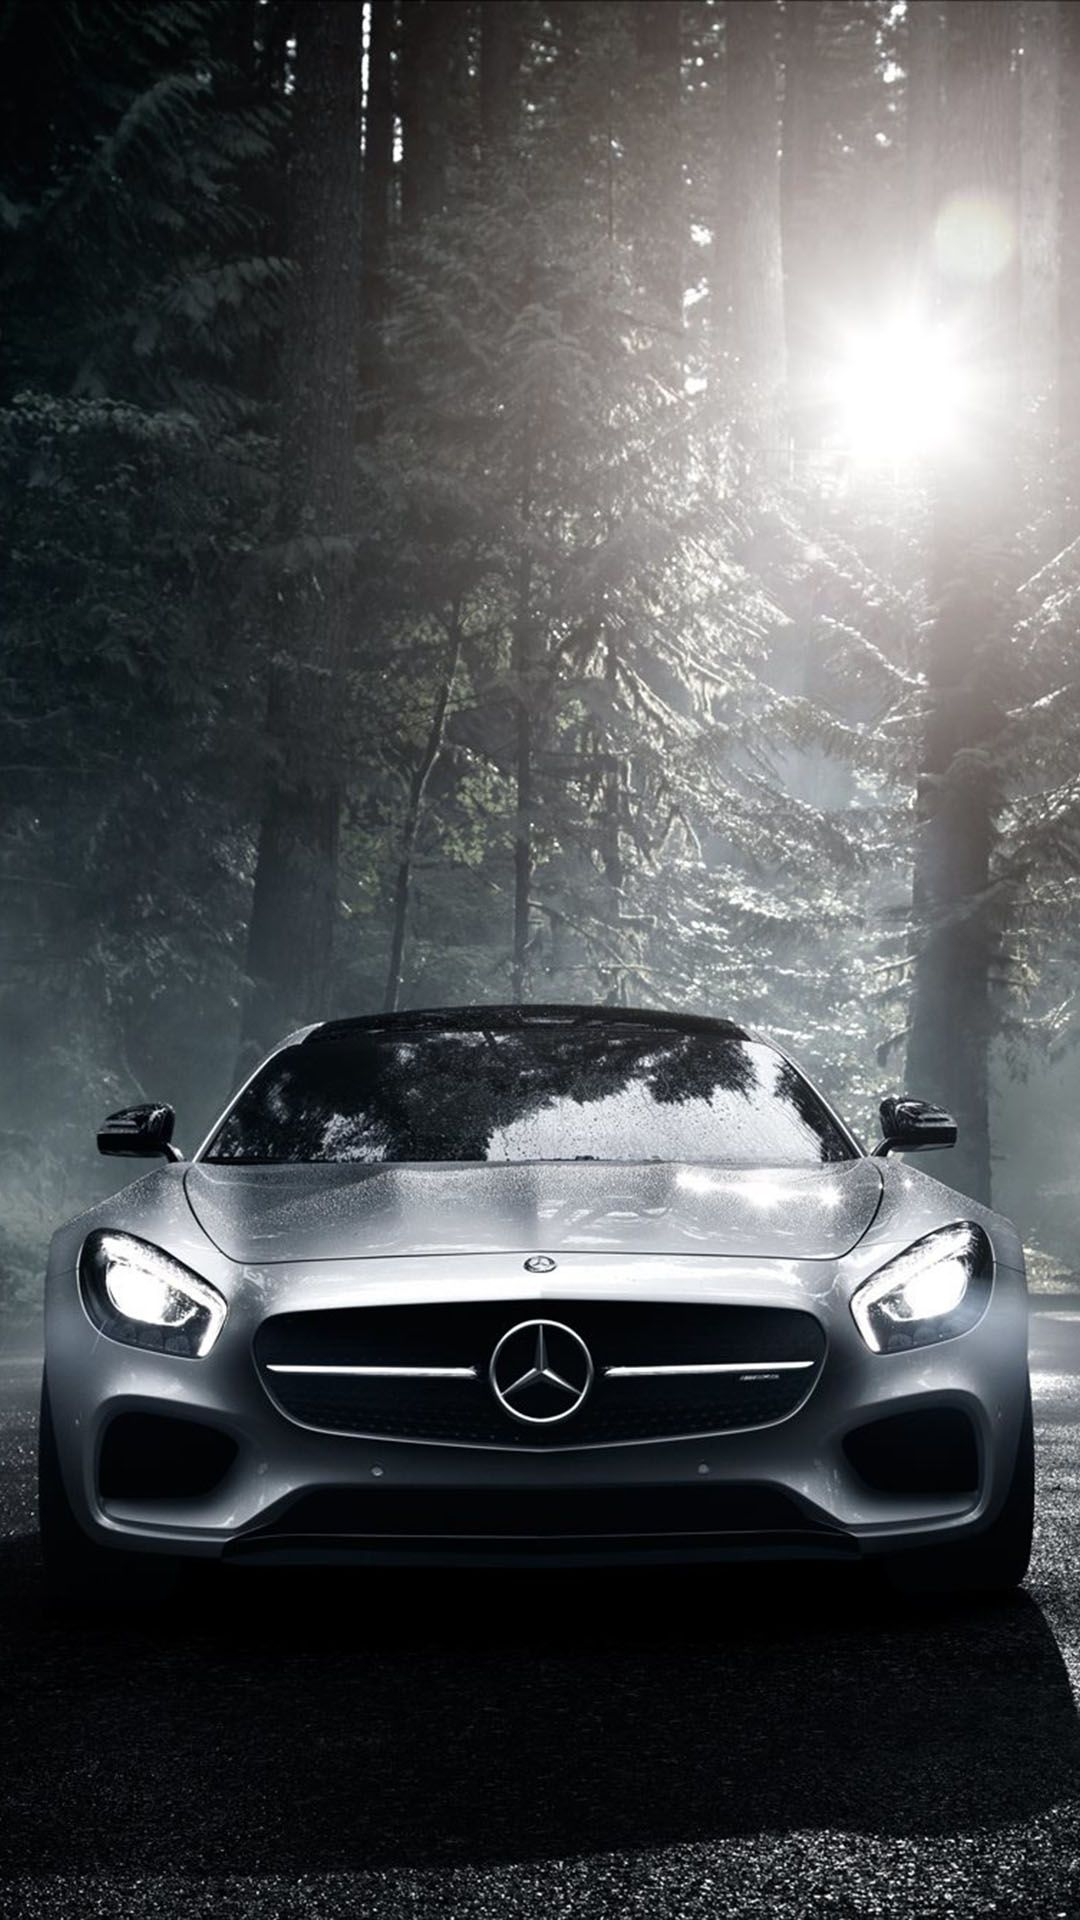 Mercedes Benz Amg Gt 1080x1920 Mercedes Wallpaper Mercedes Benz